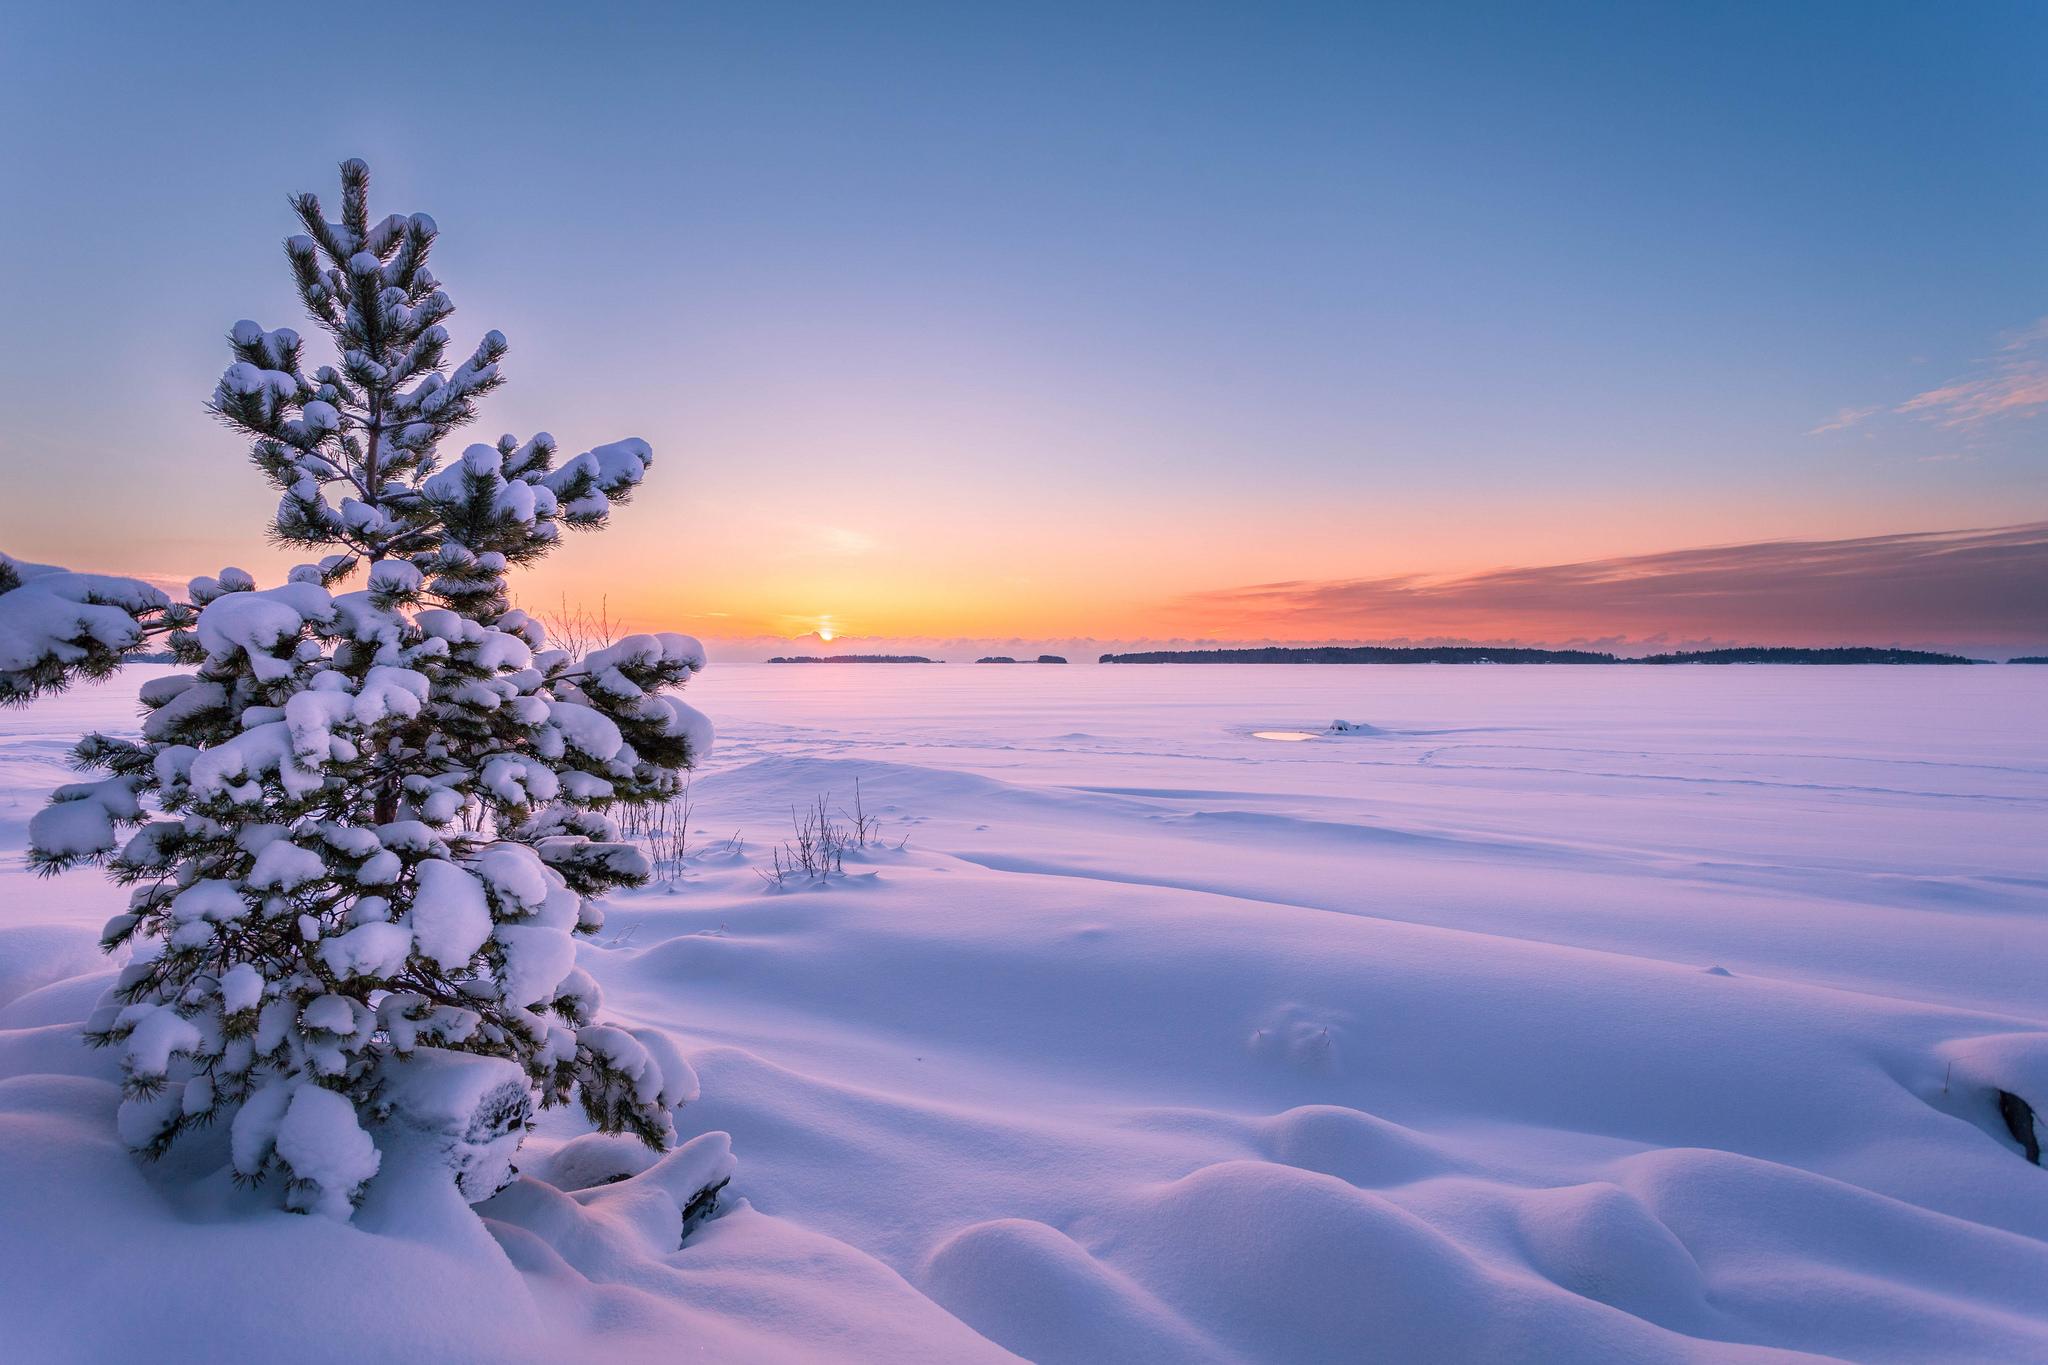 Haukilahti, Espoo, Finland